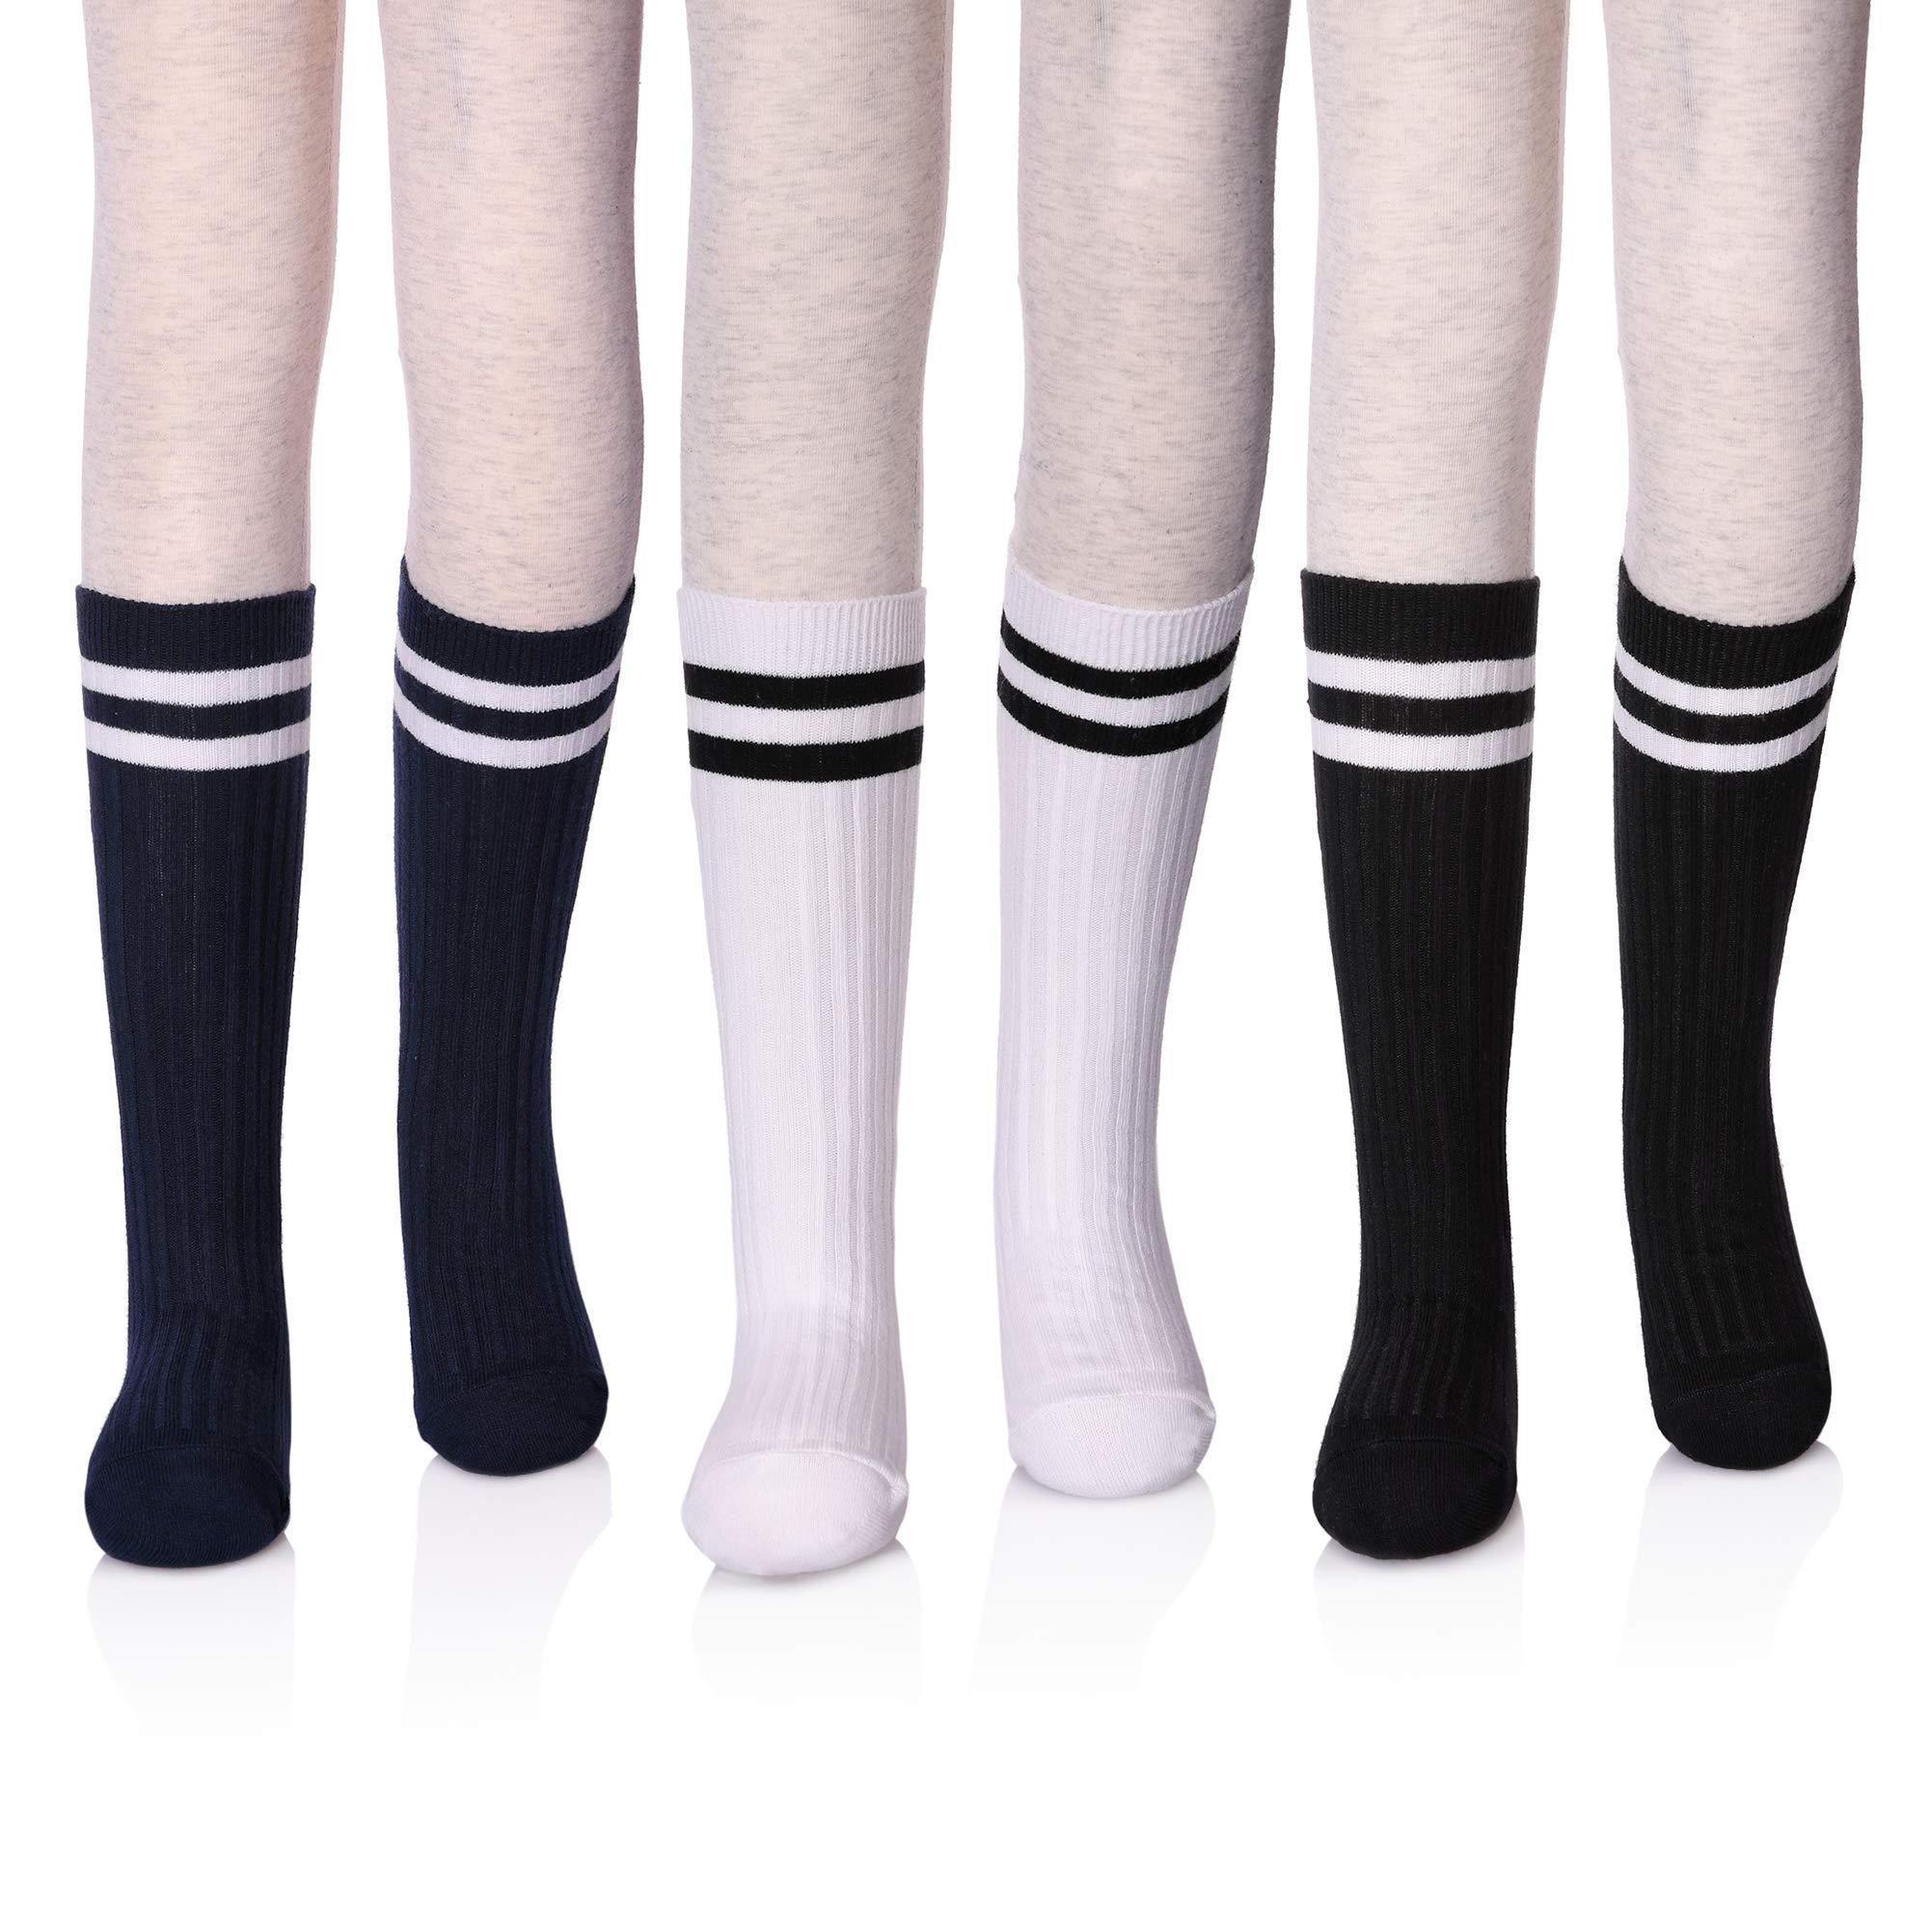 LANLEO Girls School Uniform Mid-Calf Cotton Socks Classic Stripes Athletic Soccer Tube Socks 3 Pack (3 Pairs Black/White/Navy, 9-12 Year Old)